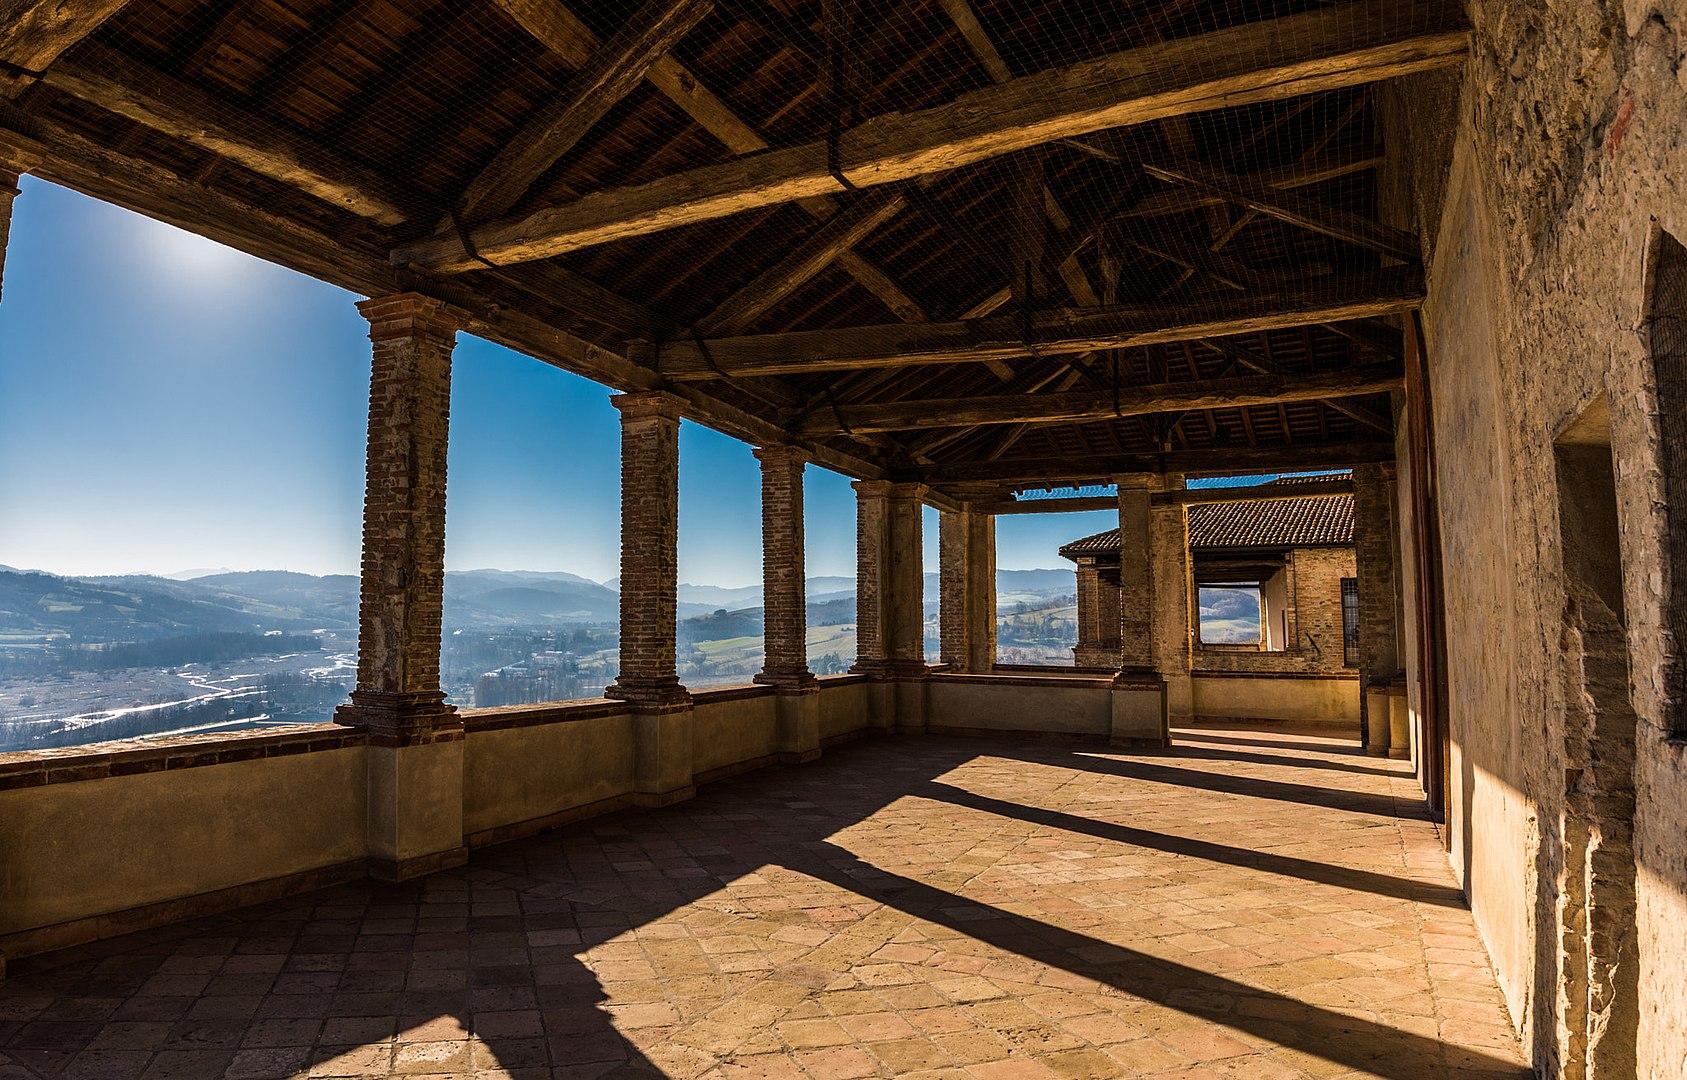 Castle of Torrechiara (Langhirano, PR) - North-East Loggia